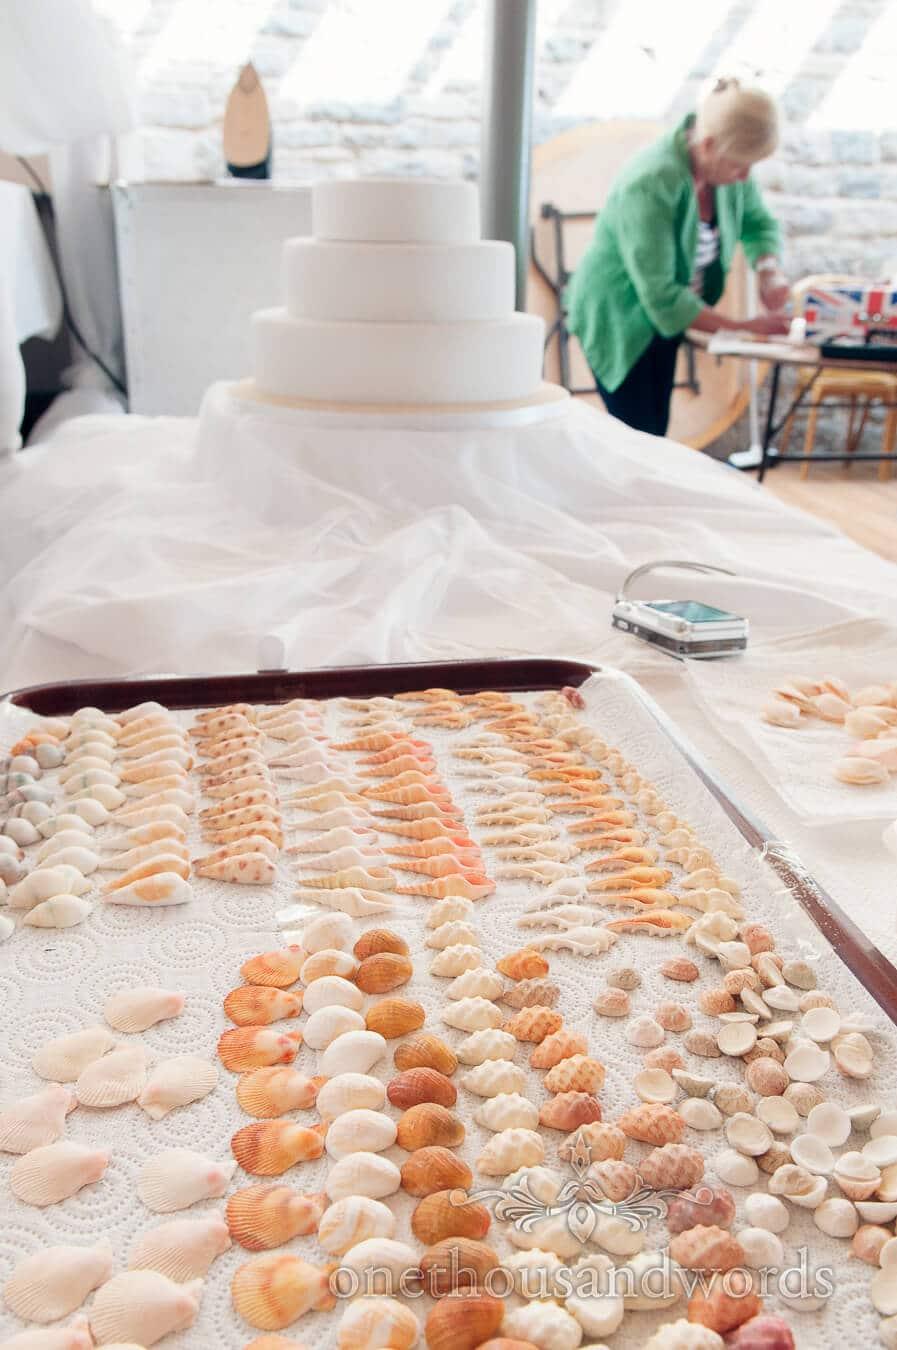 Seaside wedding cake is prepared with edible sea shells